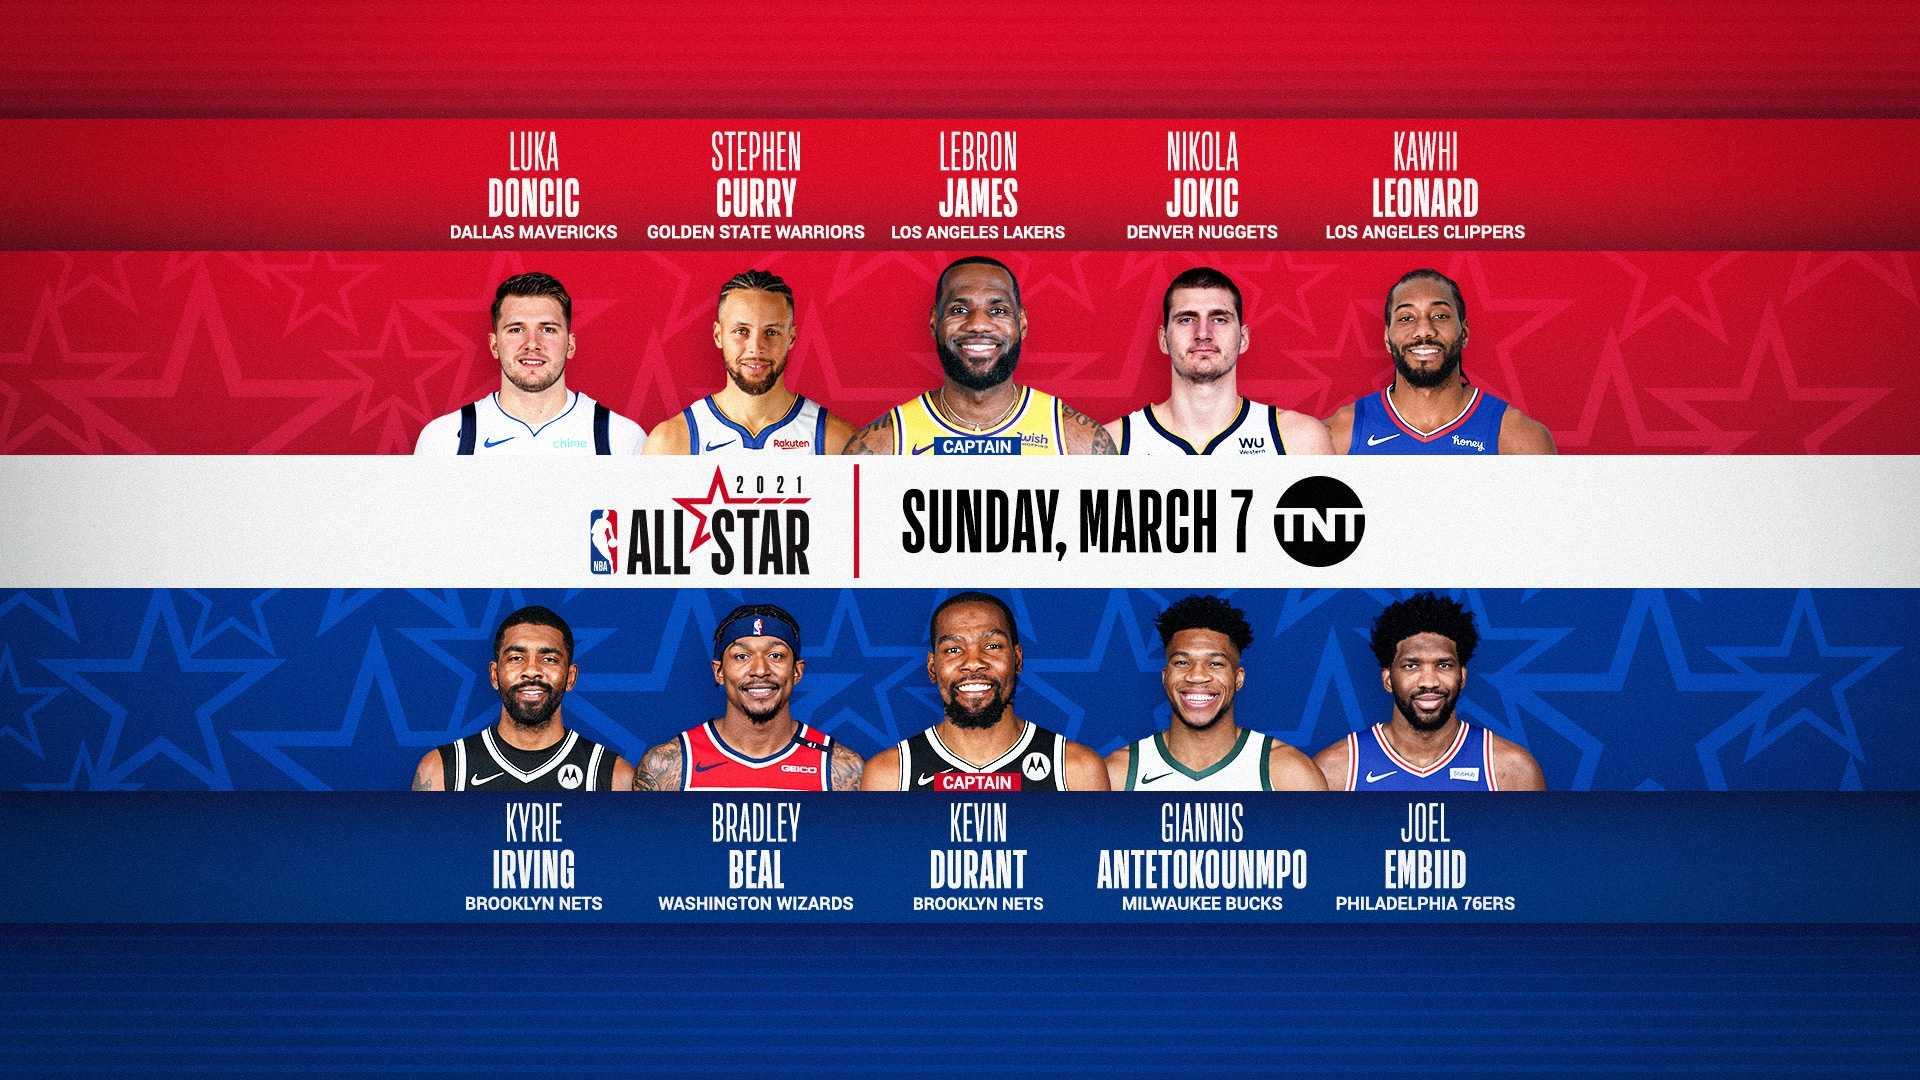 2021 NBA All-Star Starters Announced